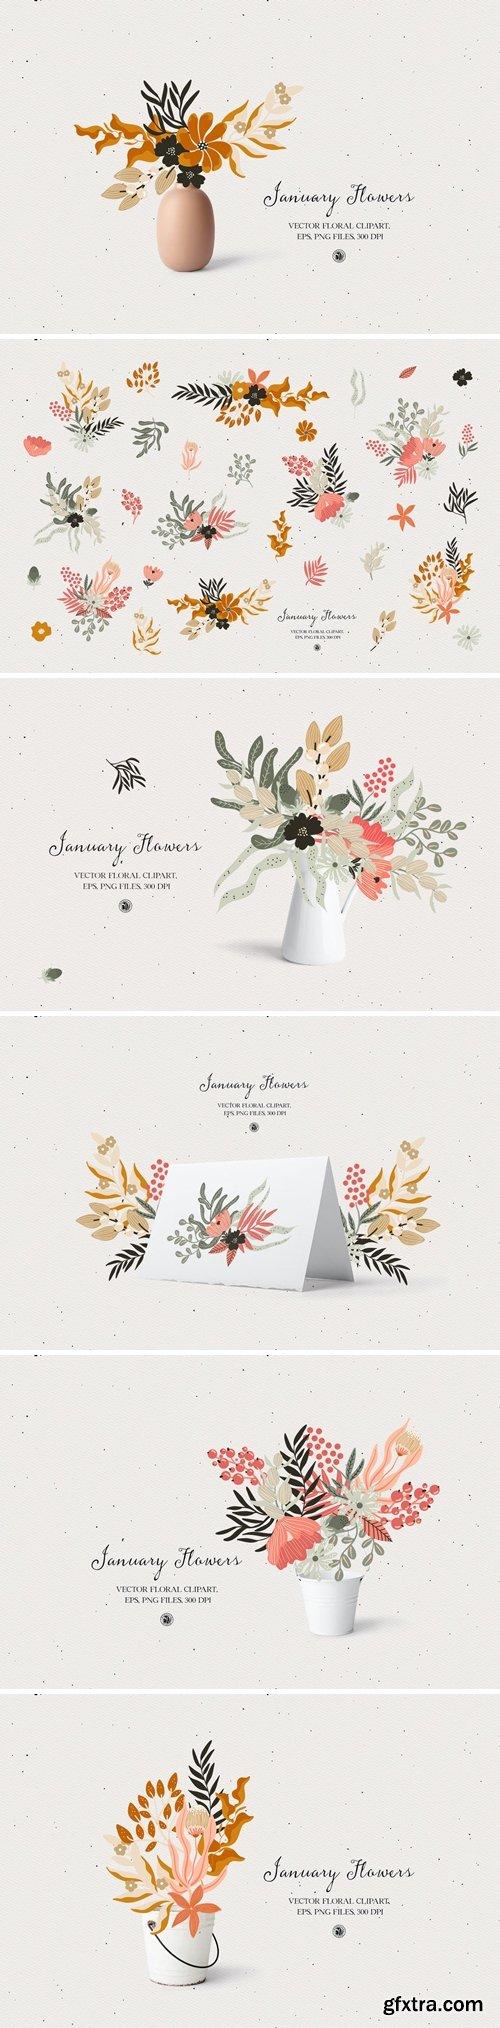 January Flowers - vector clipart set